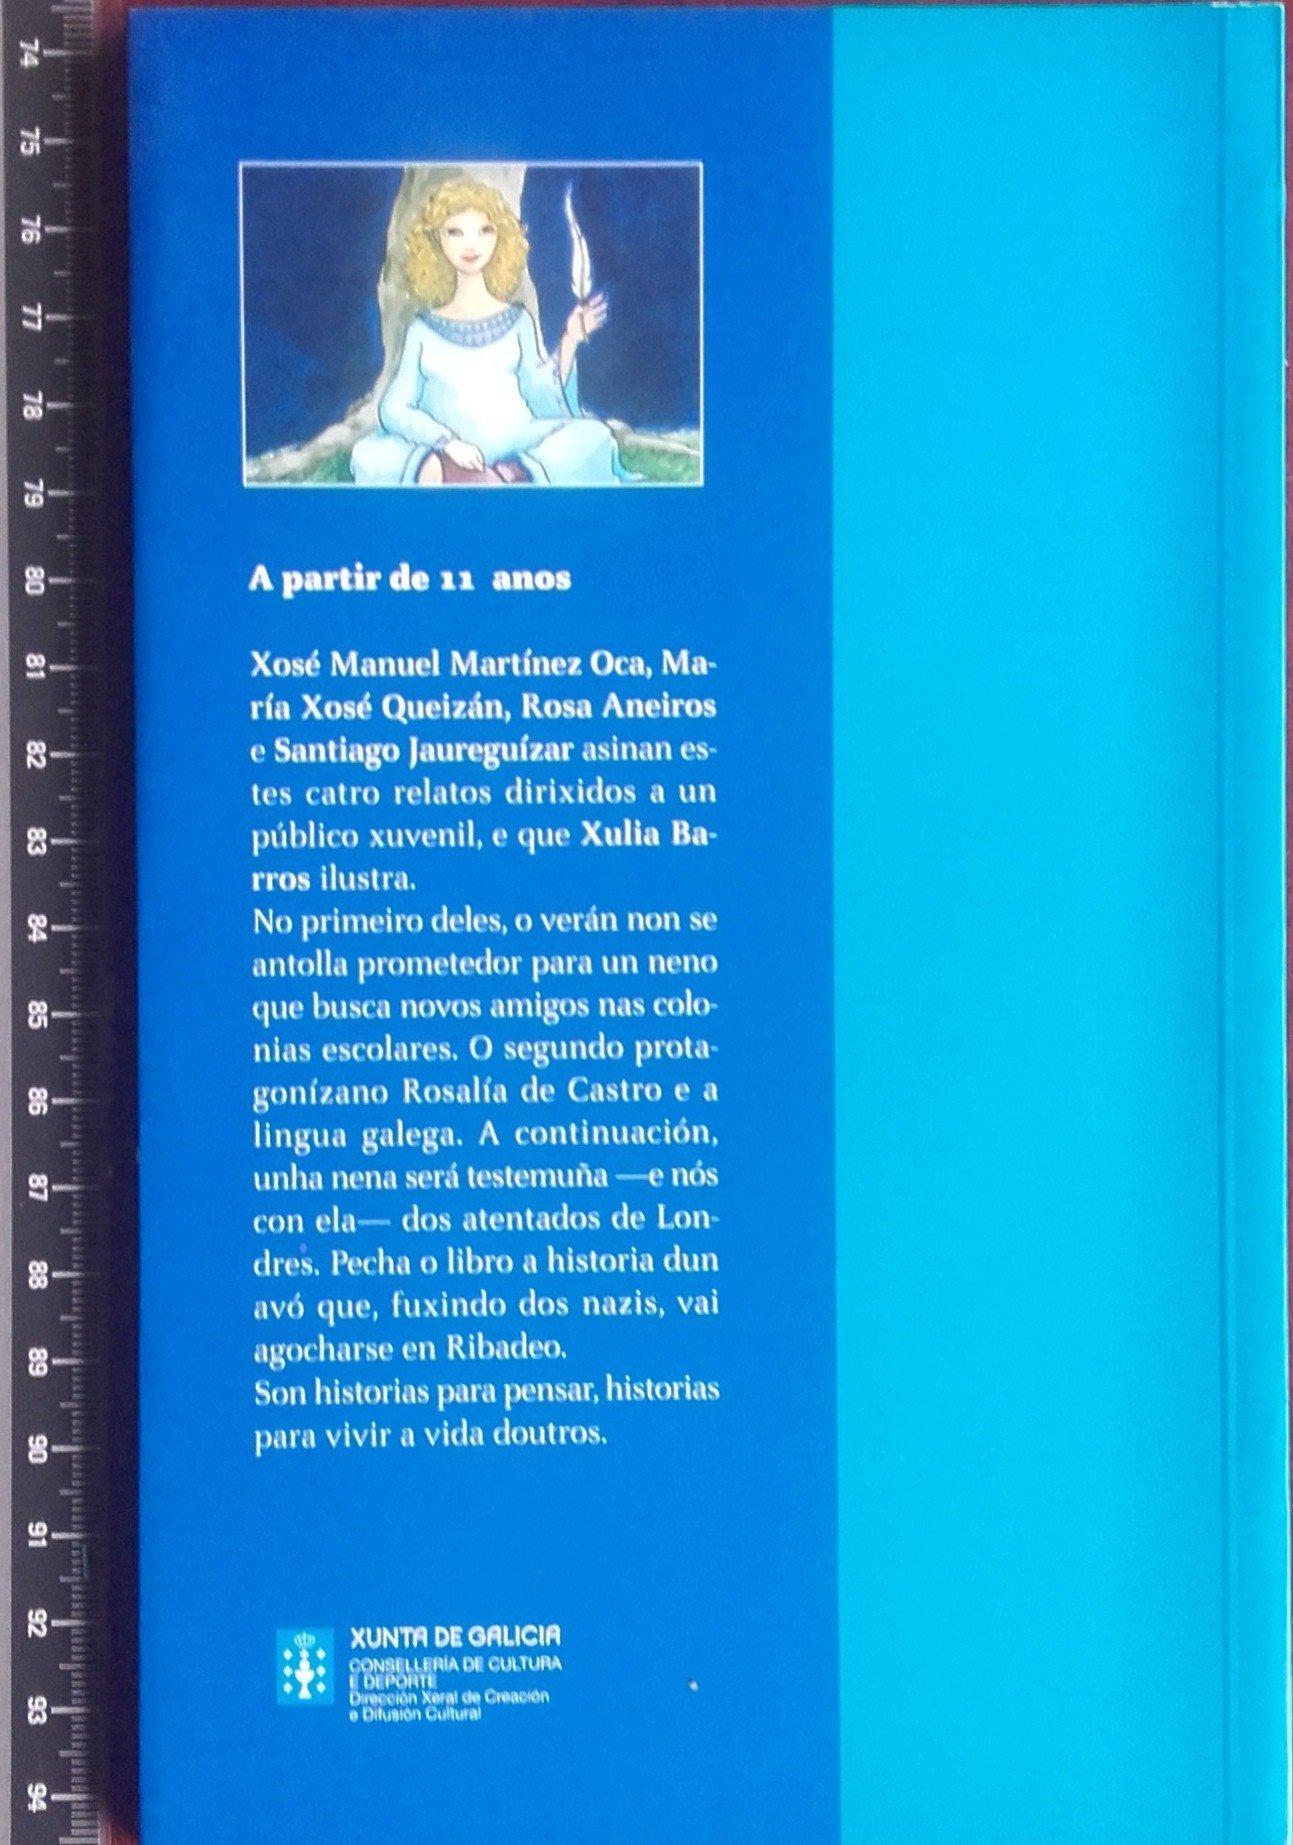 CONTOS DE COLONIAS ESCOLARES, BELAS ADORMECIDAS, ATENTADOS E TIBURONS: Amazon.es: Xosé Manuel Martínez Oca, Mª Xosé Queizán, Rosa Aneiros, Jaureguízar, ...